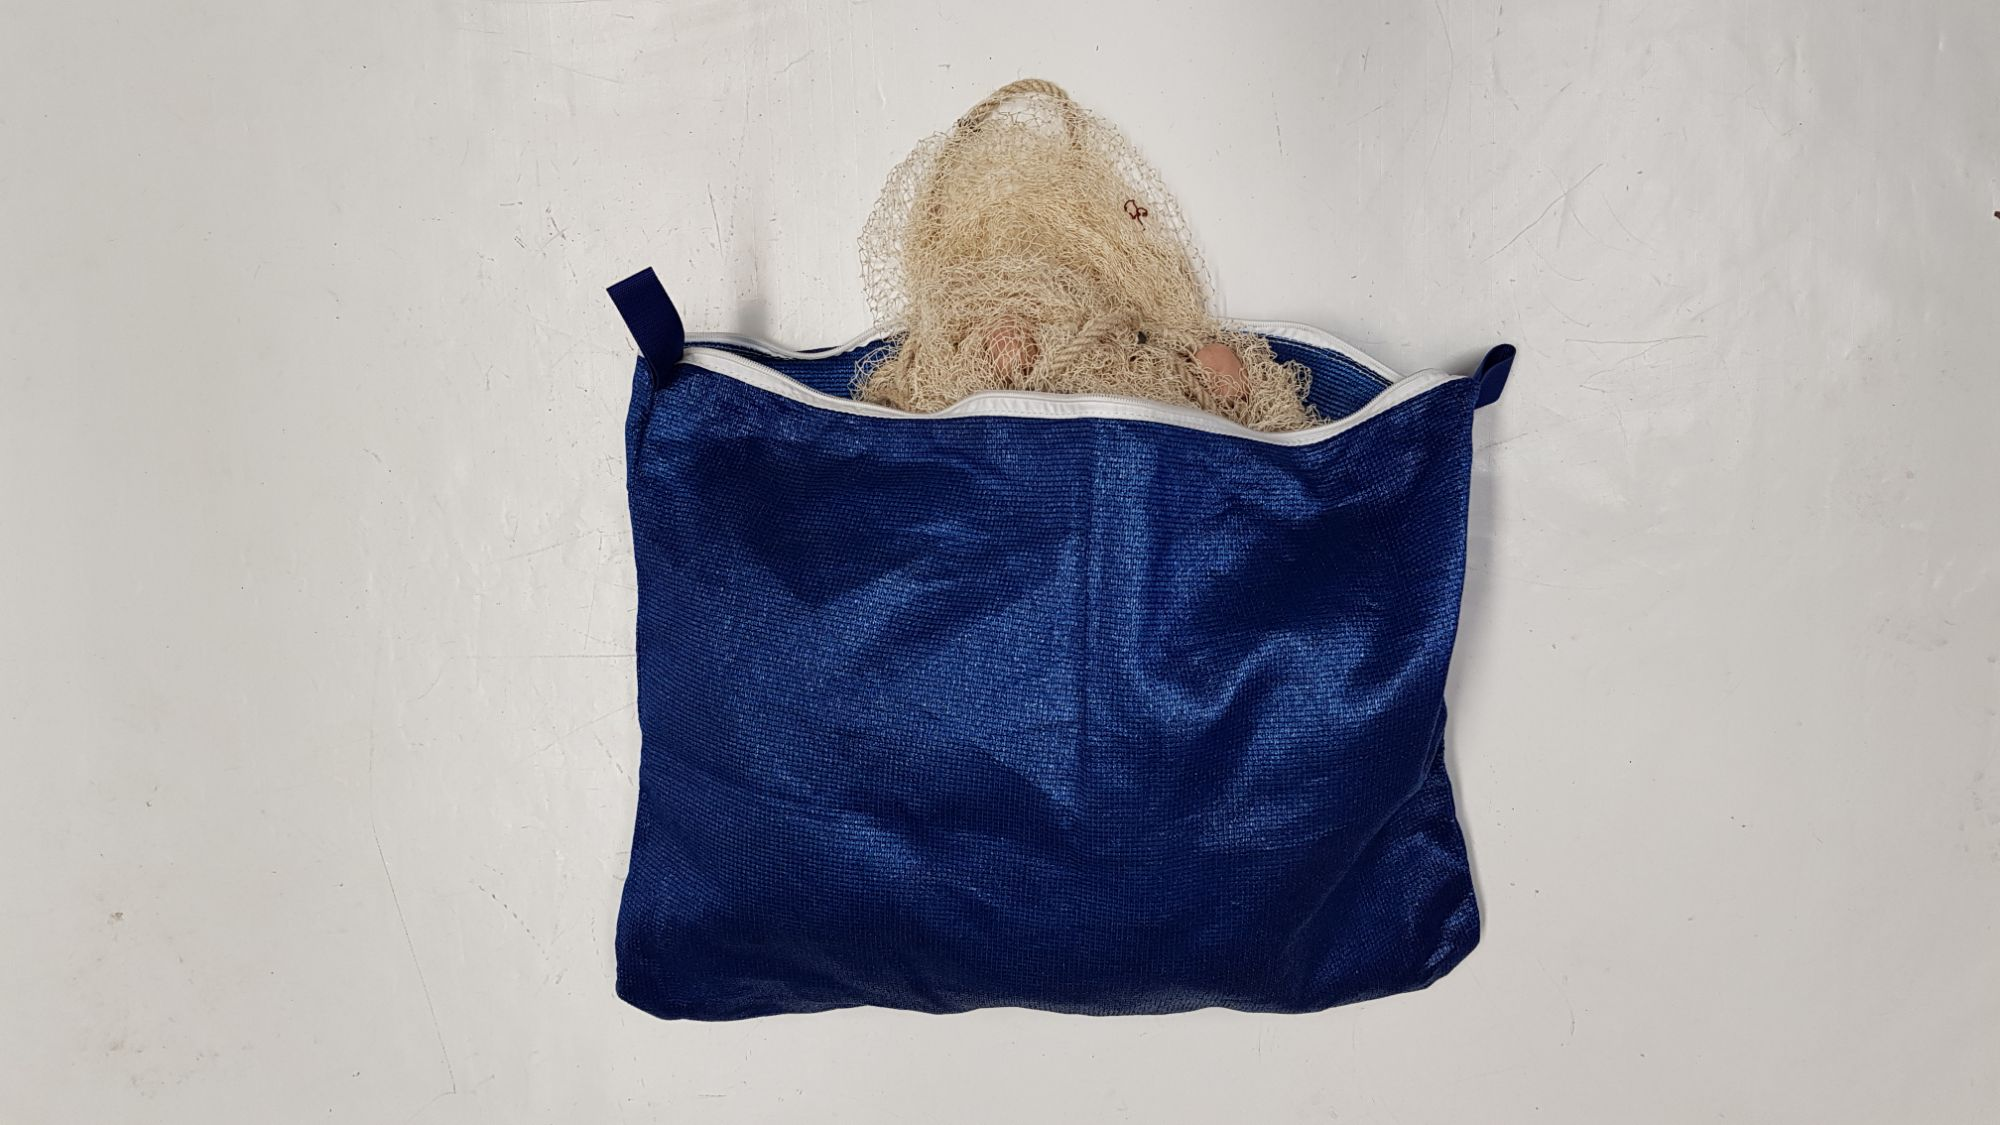 Fishing Net Bags  For Sale in Perth, Western Australia